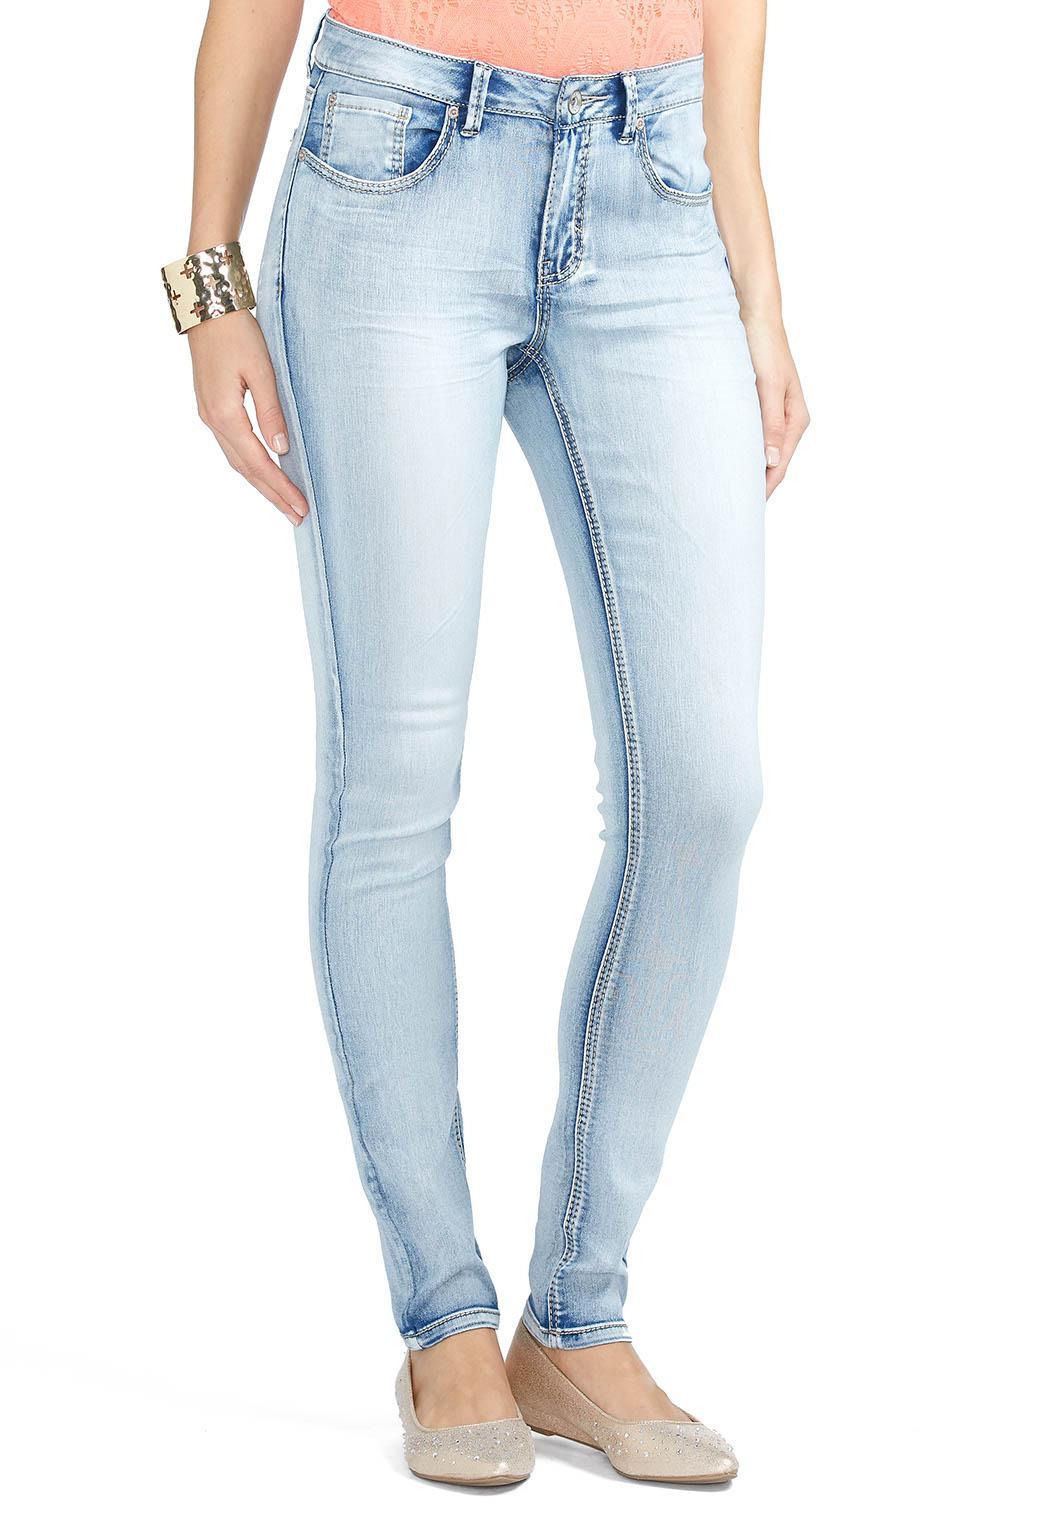 one plus length attire